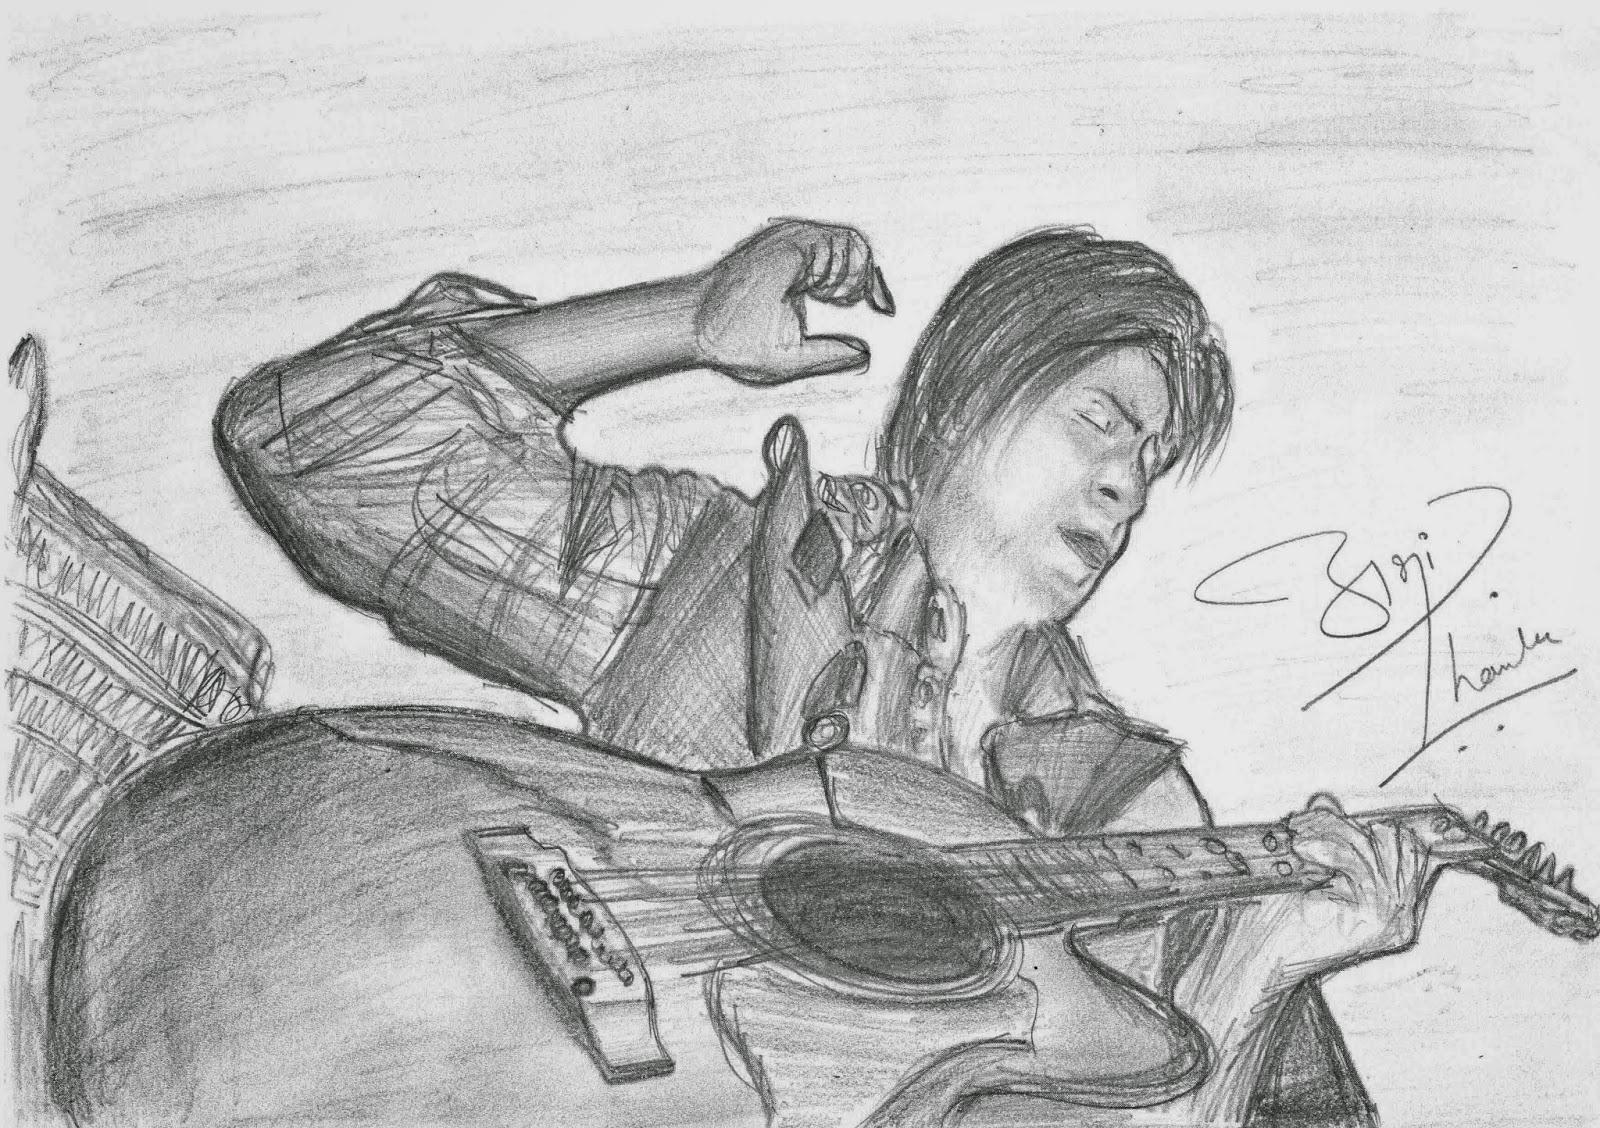 Shahrukh Khan Sketch by Abhishek Thamke